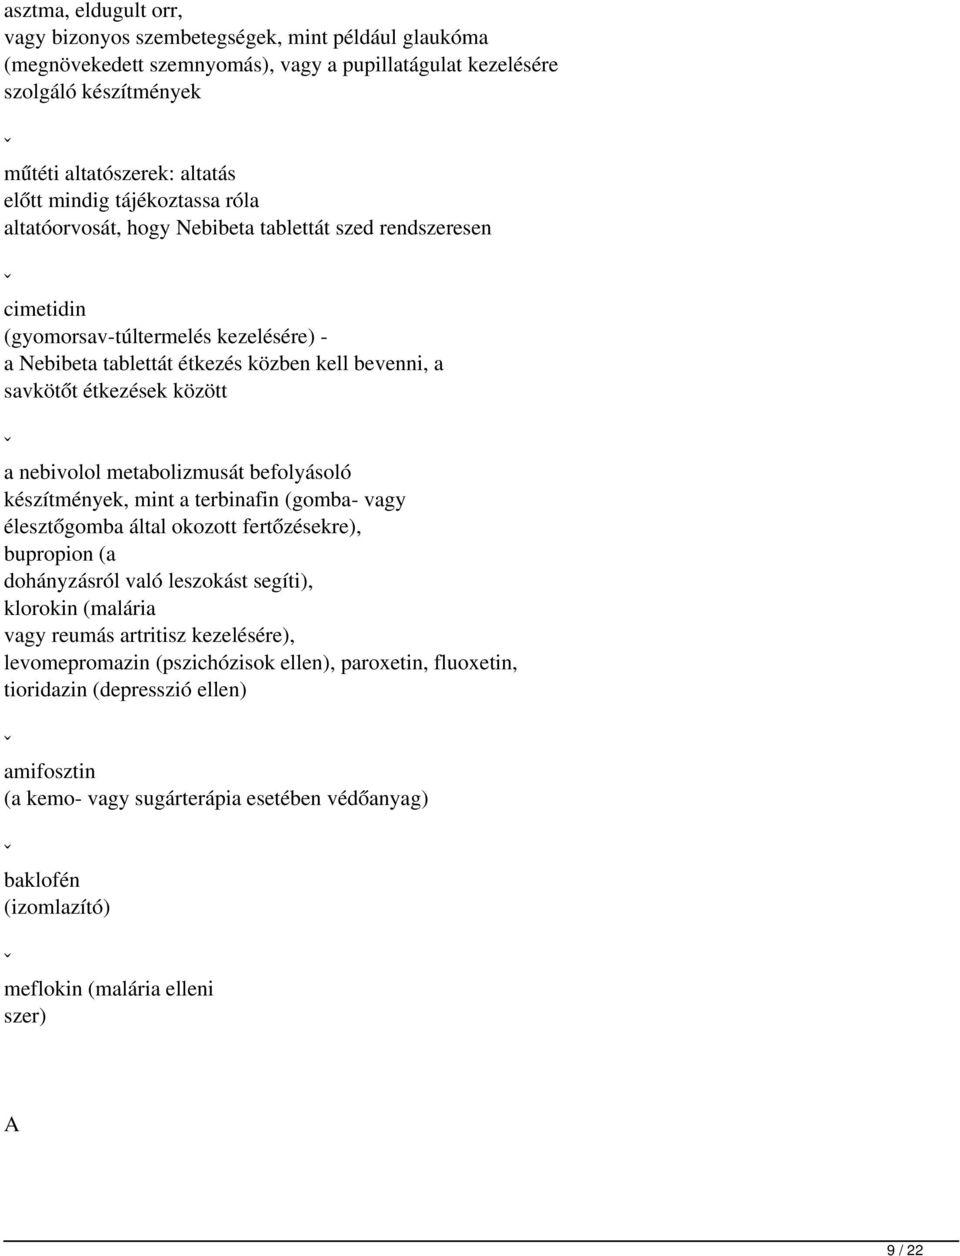 PROZAC 20 mg/5 ml belsőleges oldat